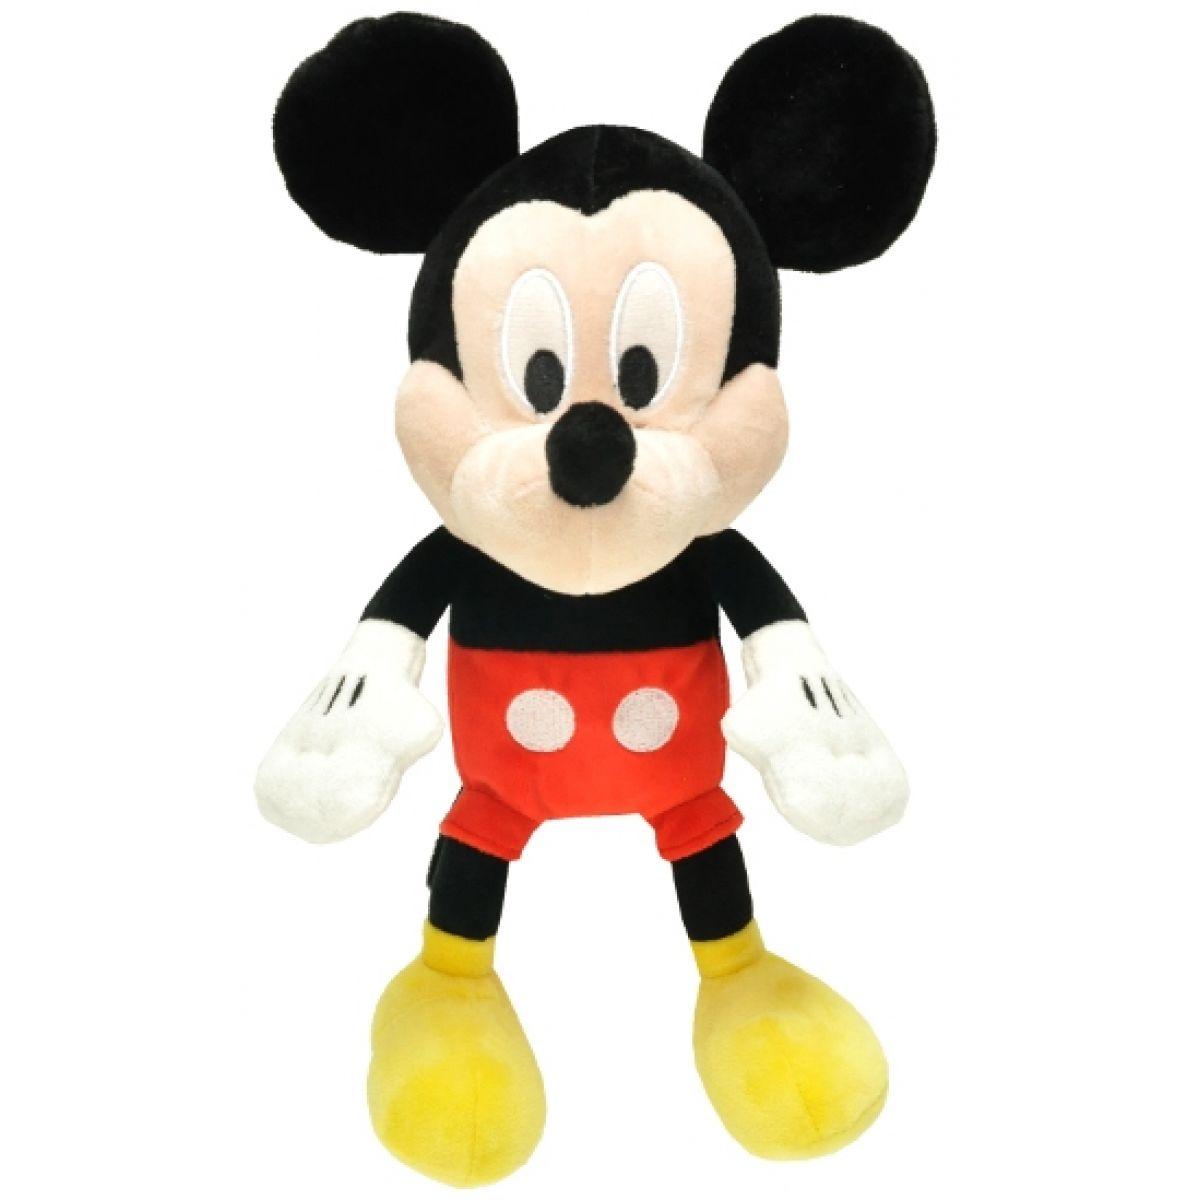 Teddies Plyšová postavička se zvukem - Mickey Mouse 30cm